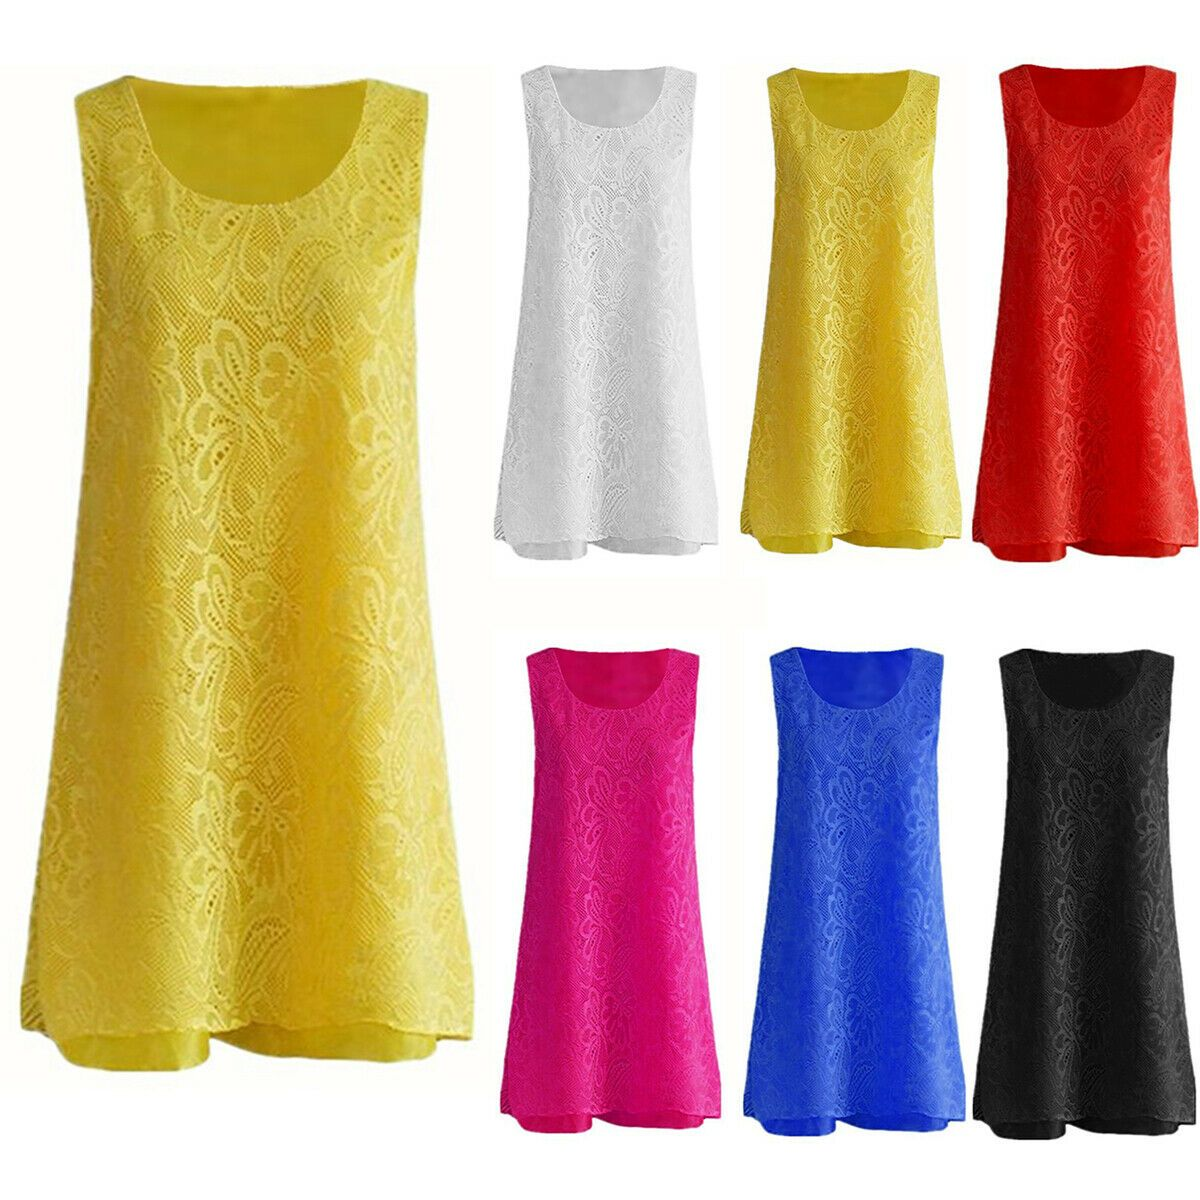 By Alina Damenkleid Longshirt Tunika Minikleid Hemdblusenkleid Longbluse  XS-M